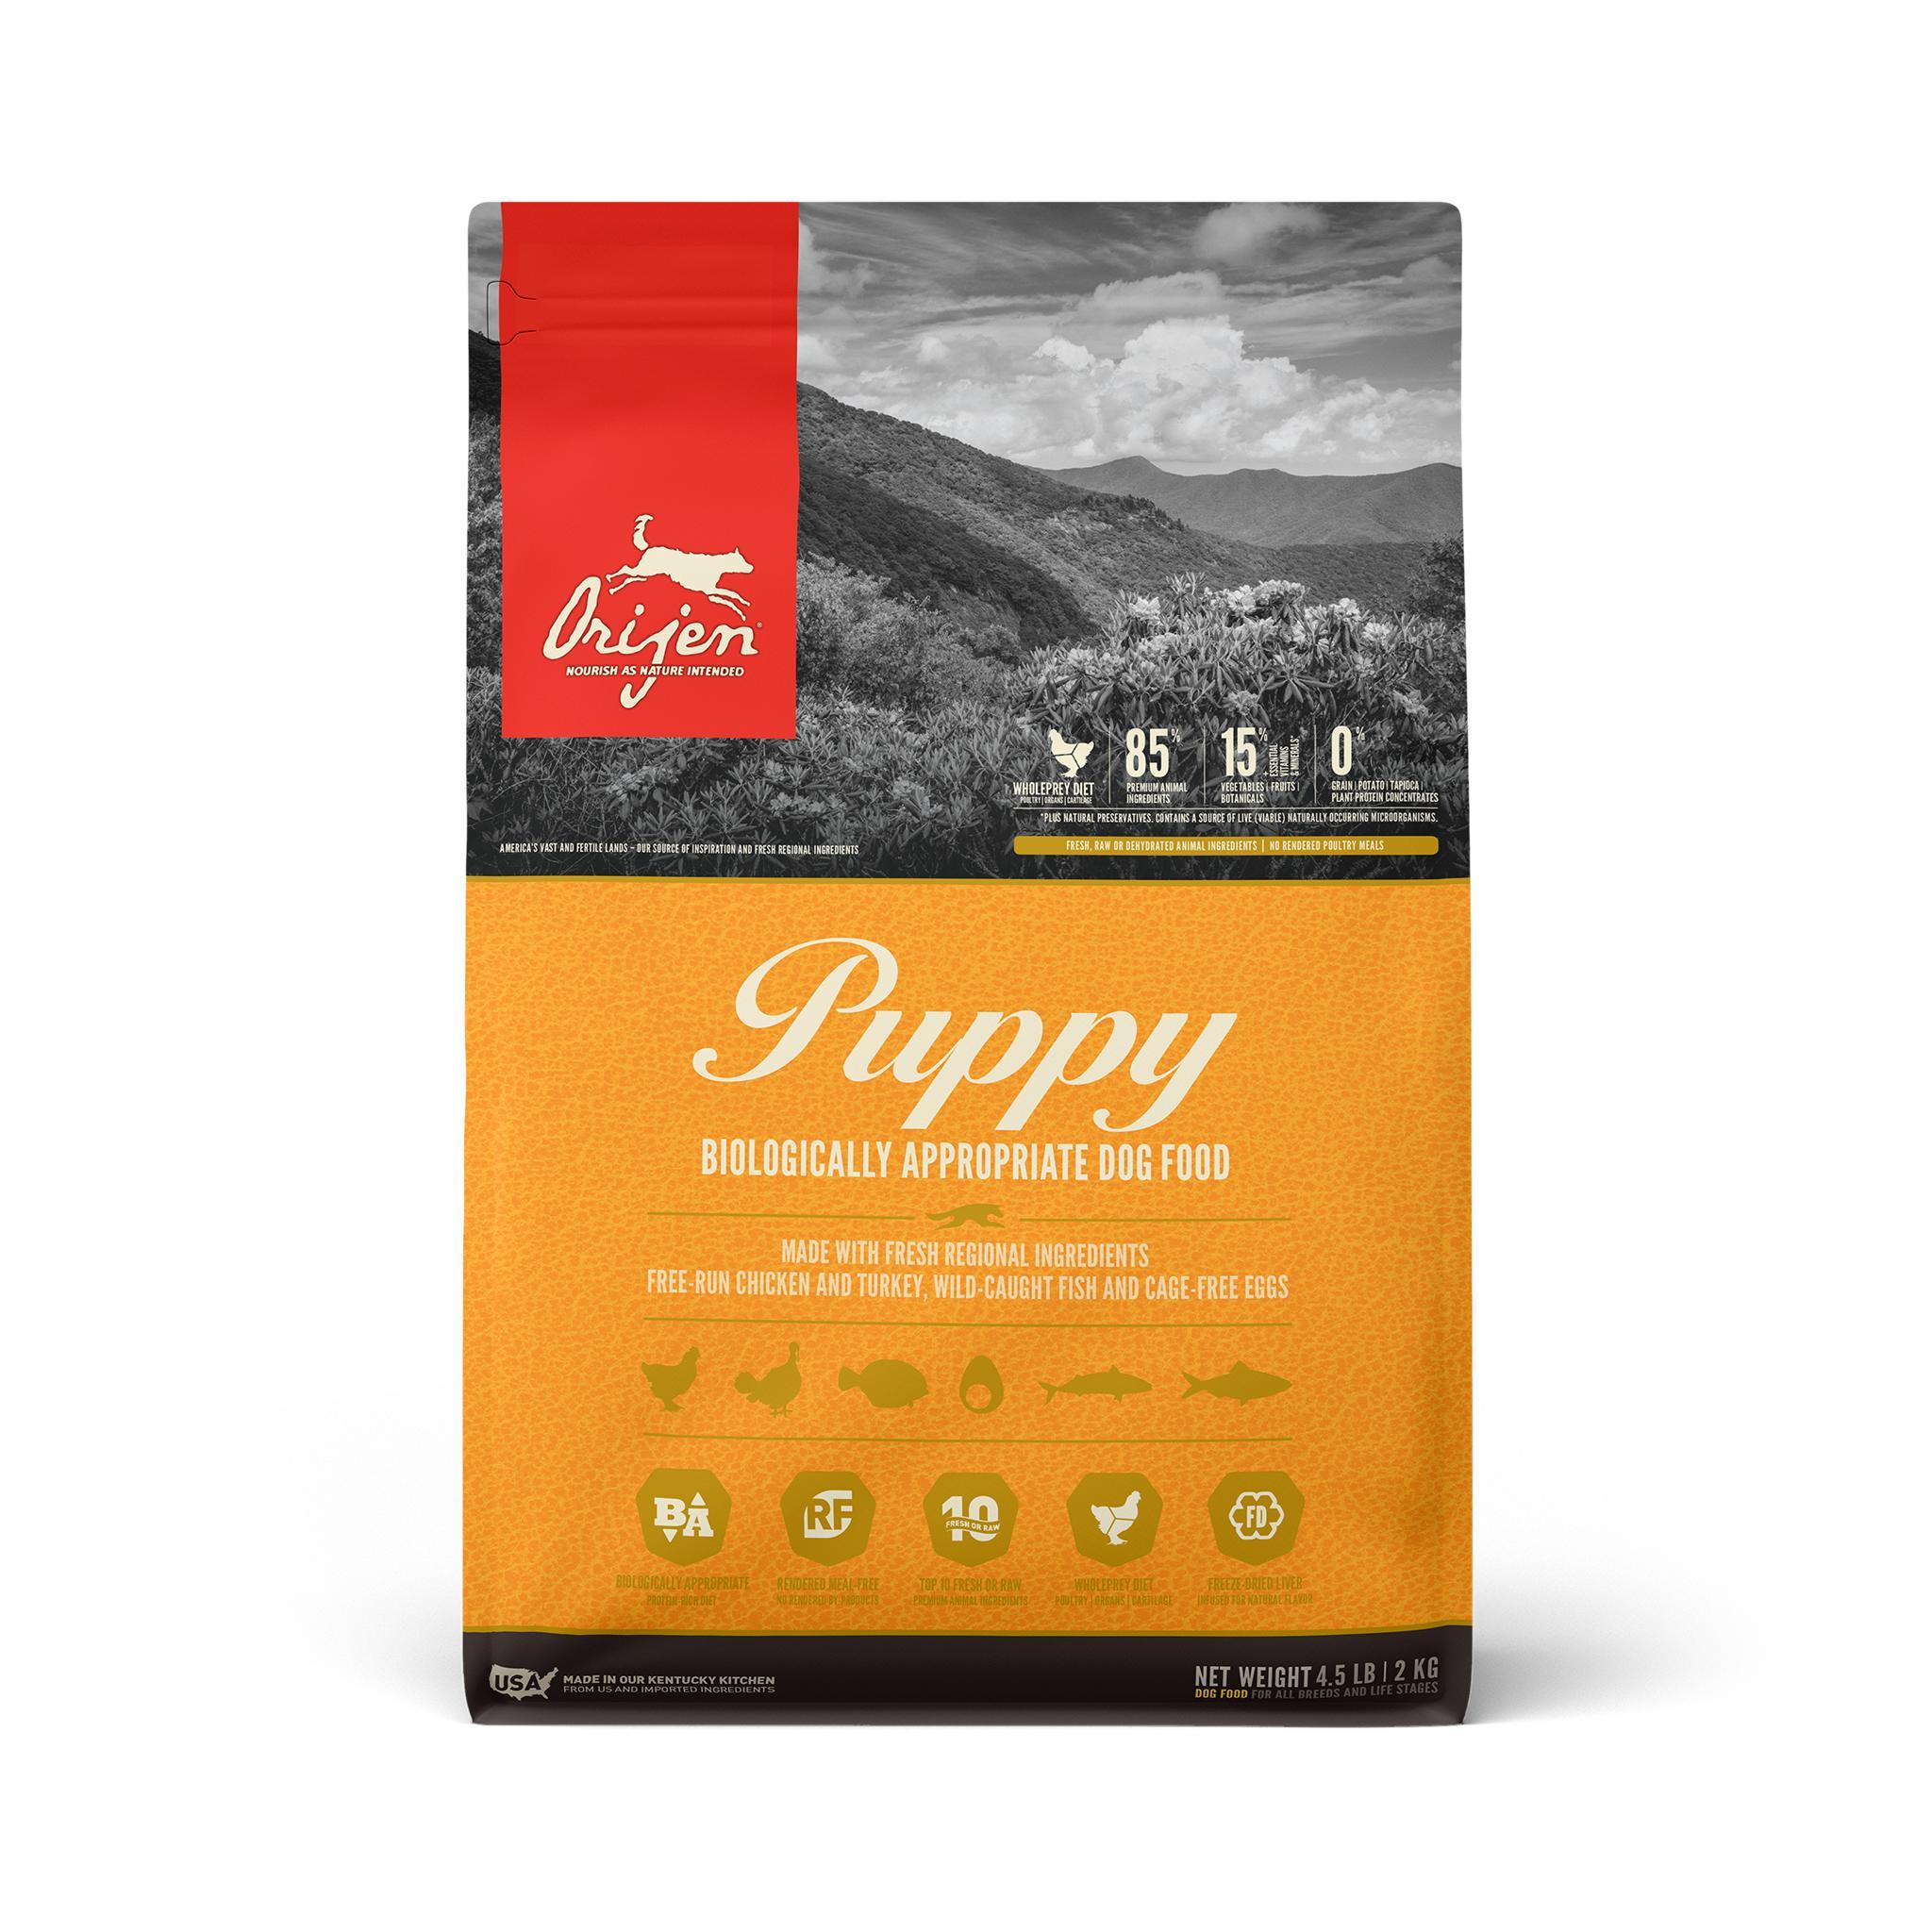 ORIJEN Puppy Grain-Free Dry Dog Food, 4.5-lb